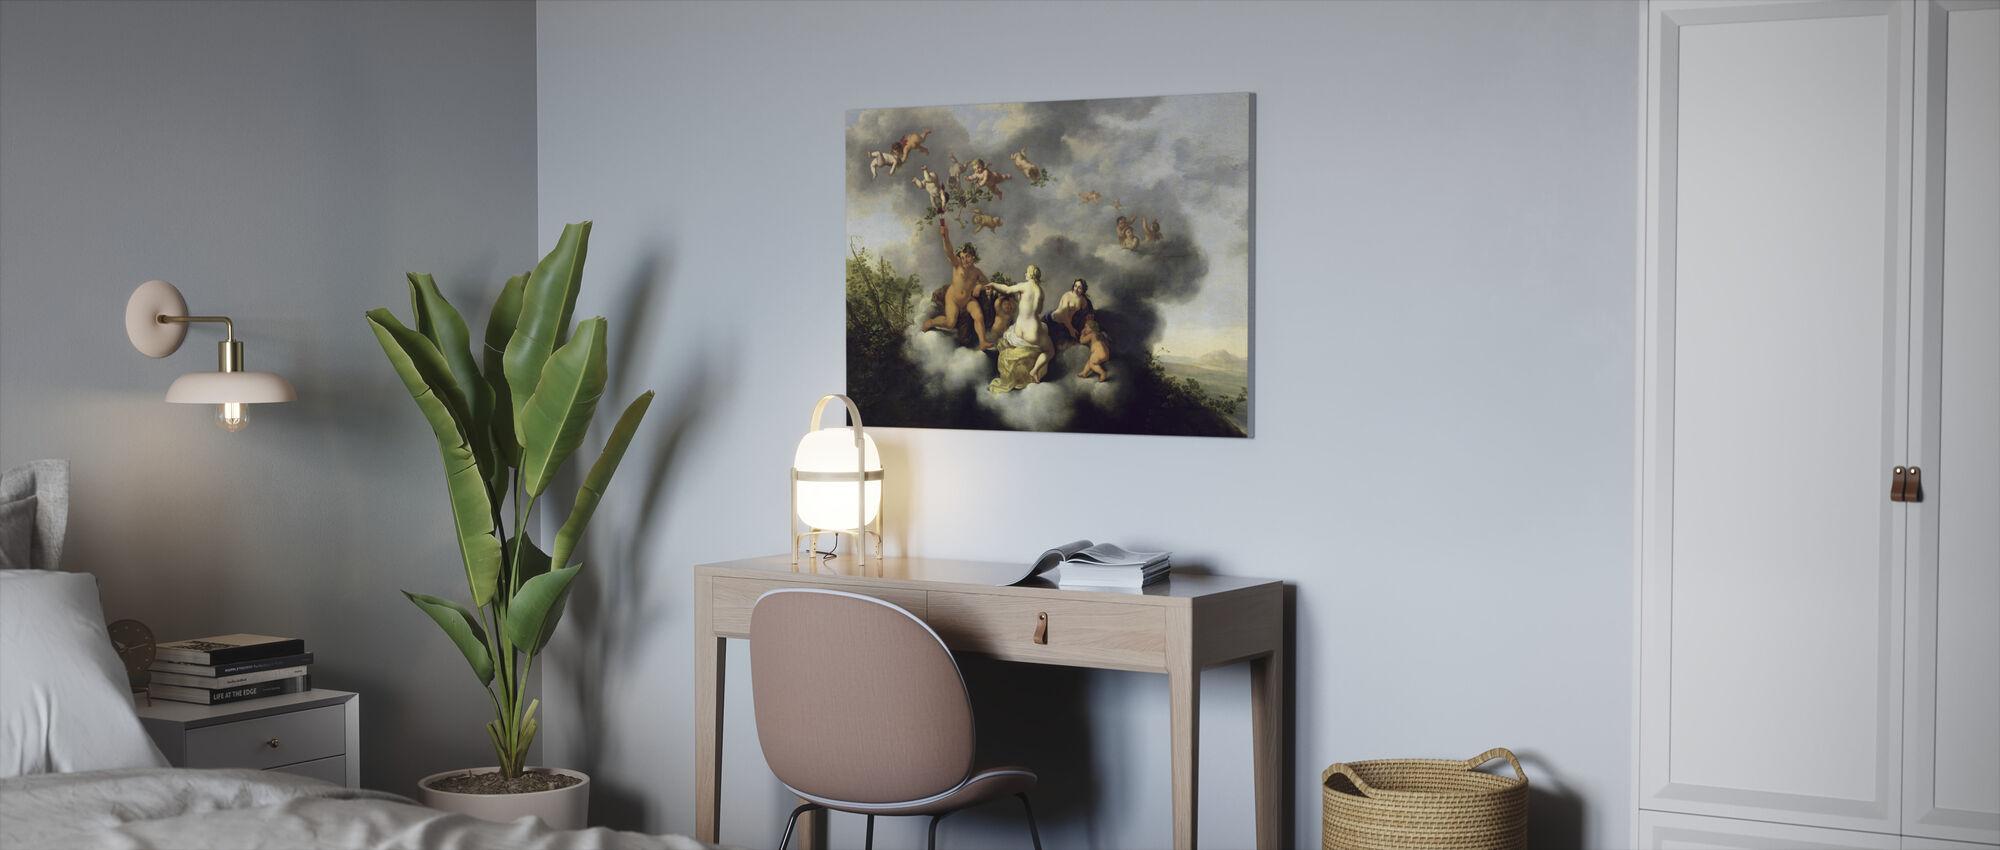 Venus og Cupid - Cornelis van Poelenburgh - Lerretsbilde - Kontor